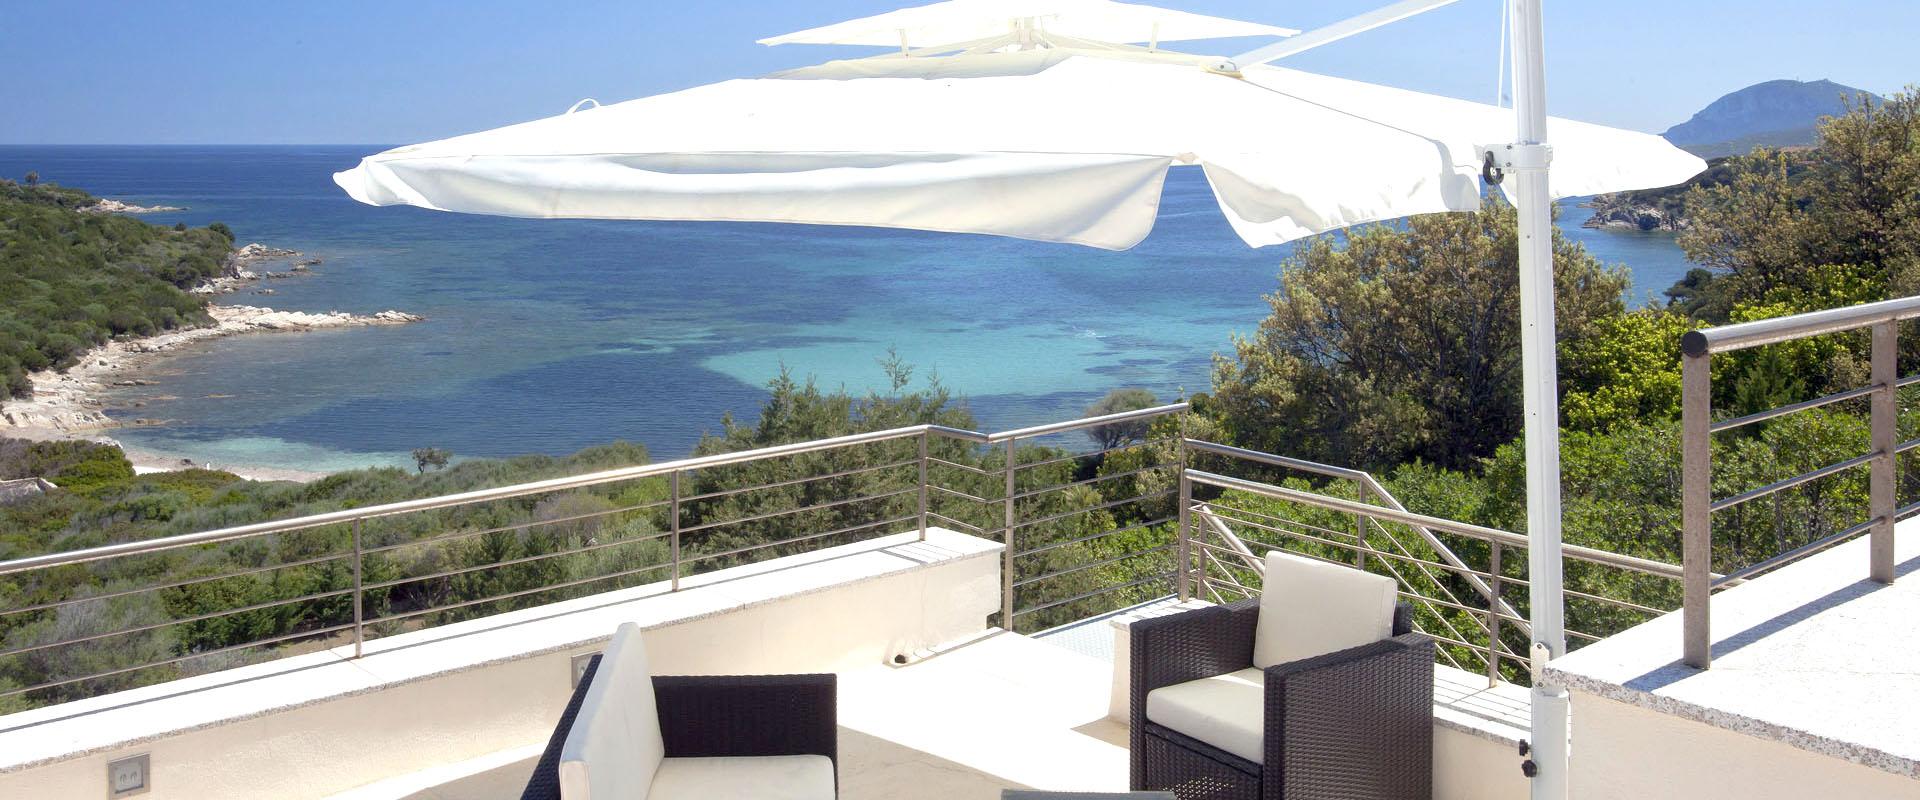 Luxury-Villa-WhiteBEach-Portorotondo-Sardinia-Rent4